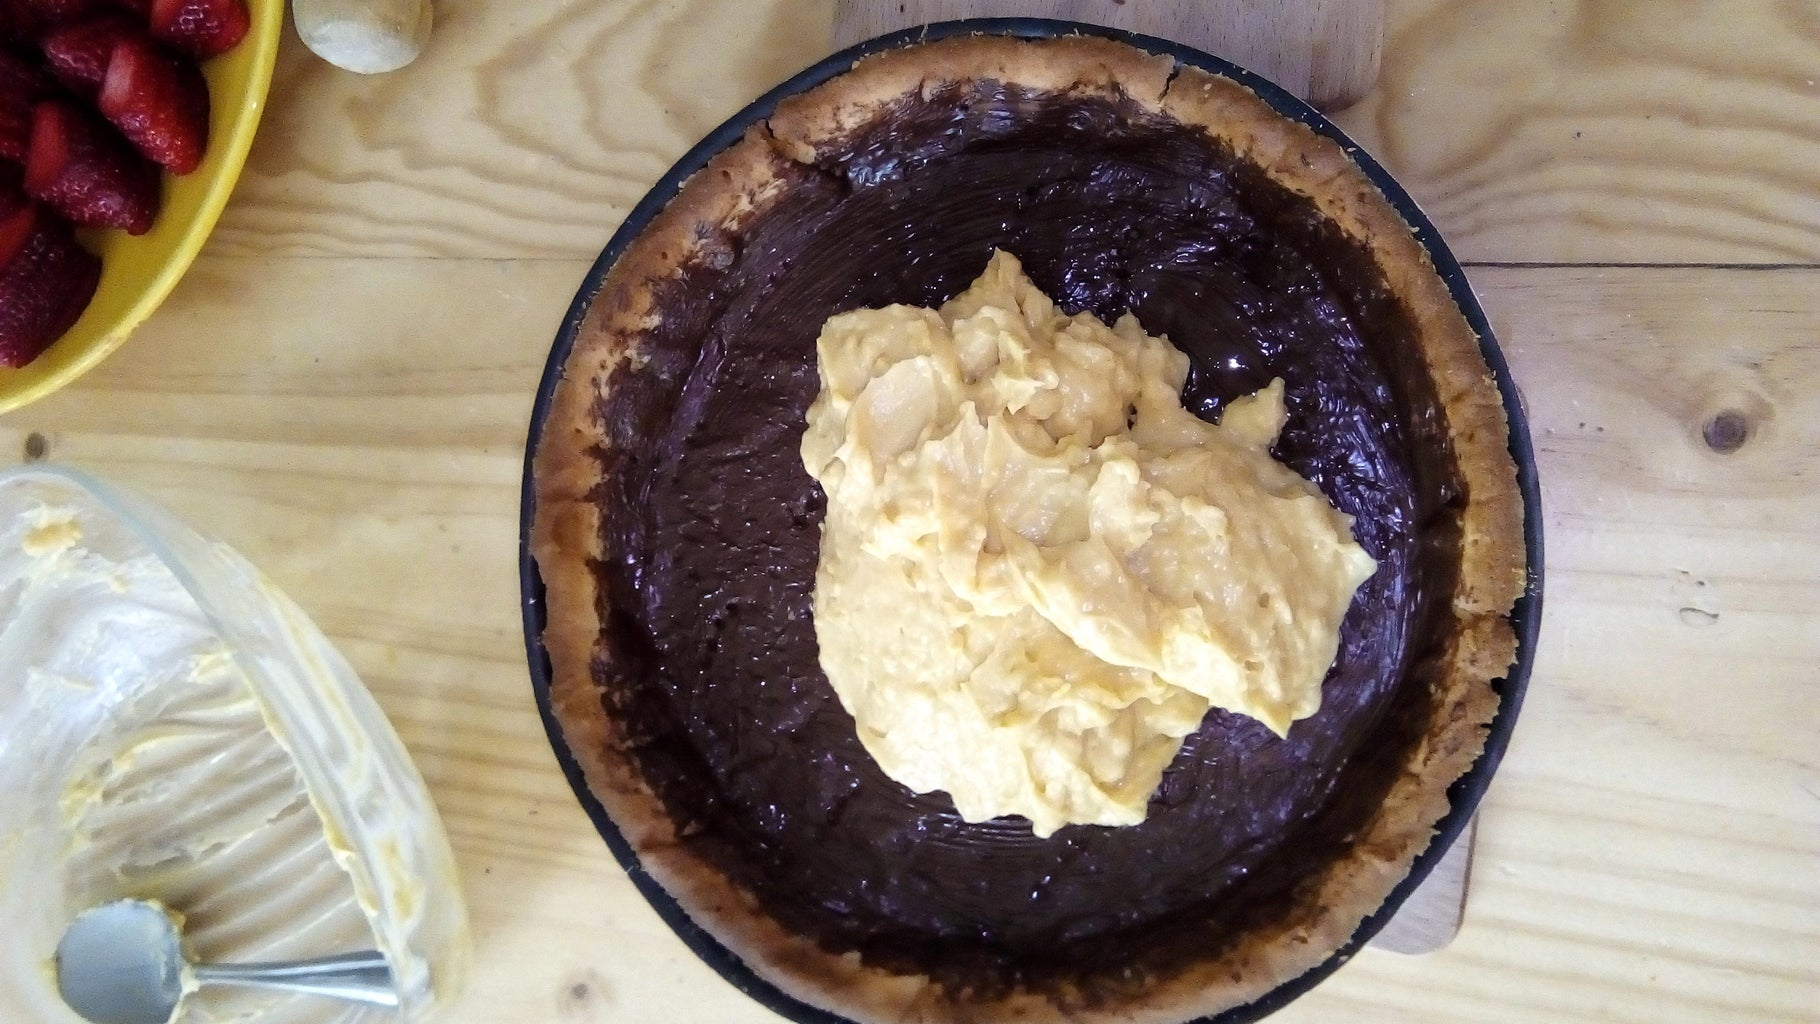 Step 5: Pie Assembly